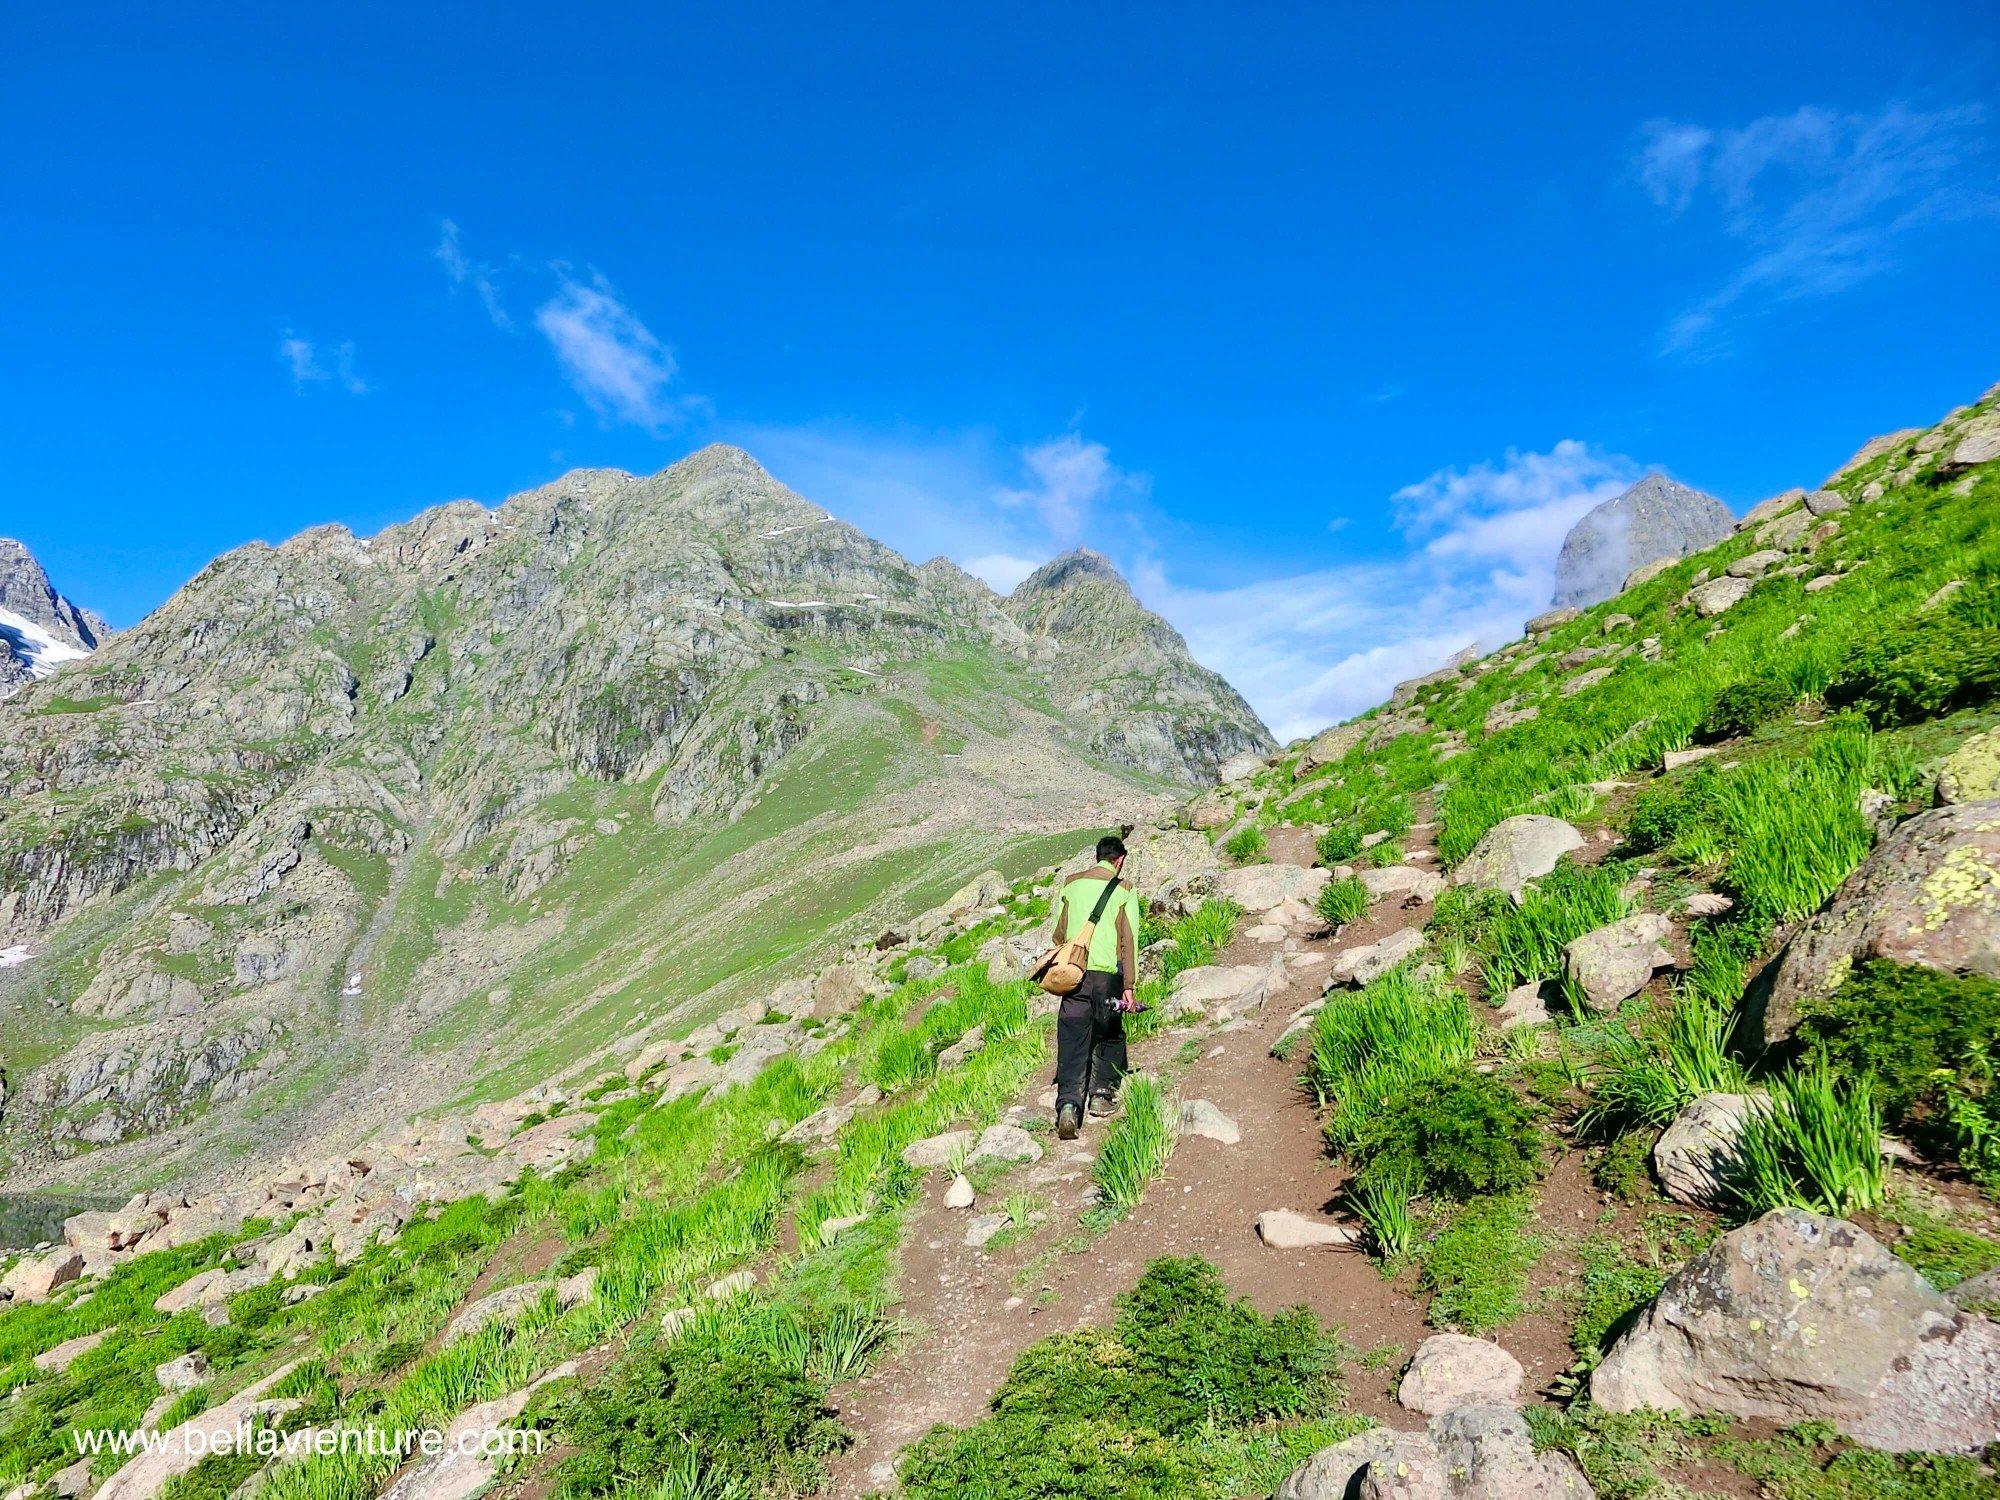 印度India 北北印North Inida  喀什米爾Kashmir 健行Trekking 啟程